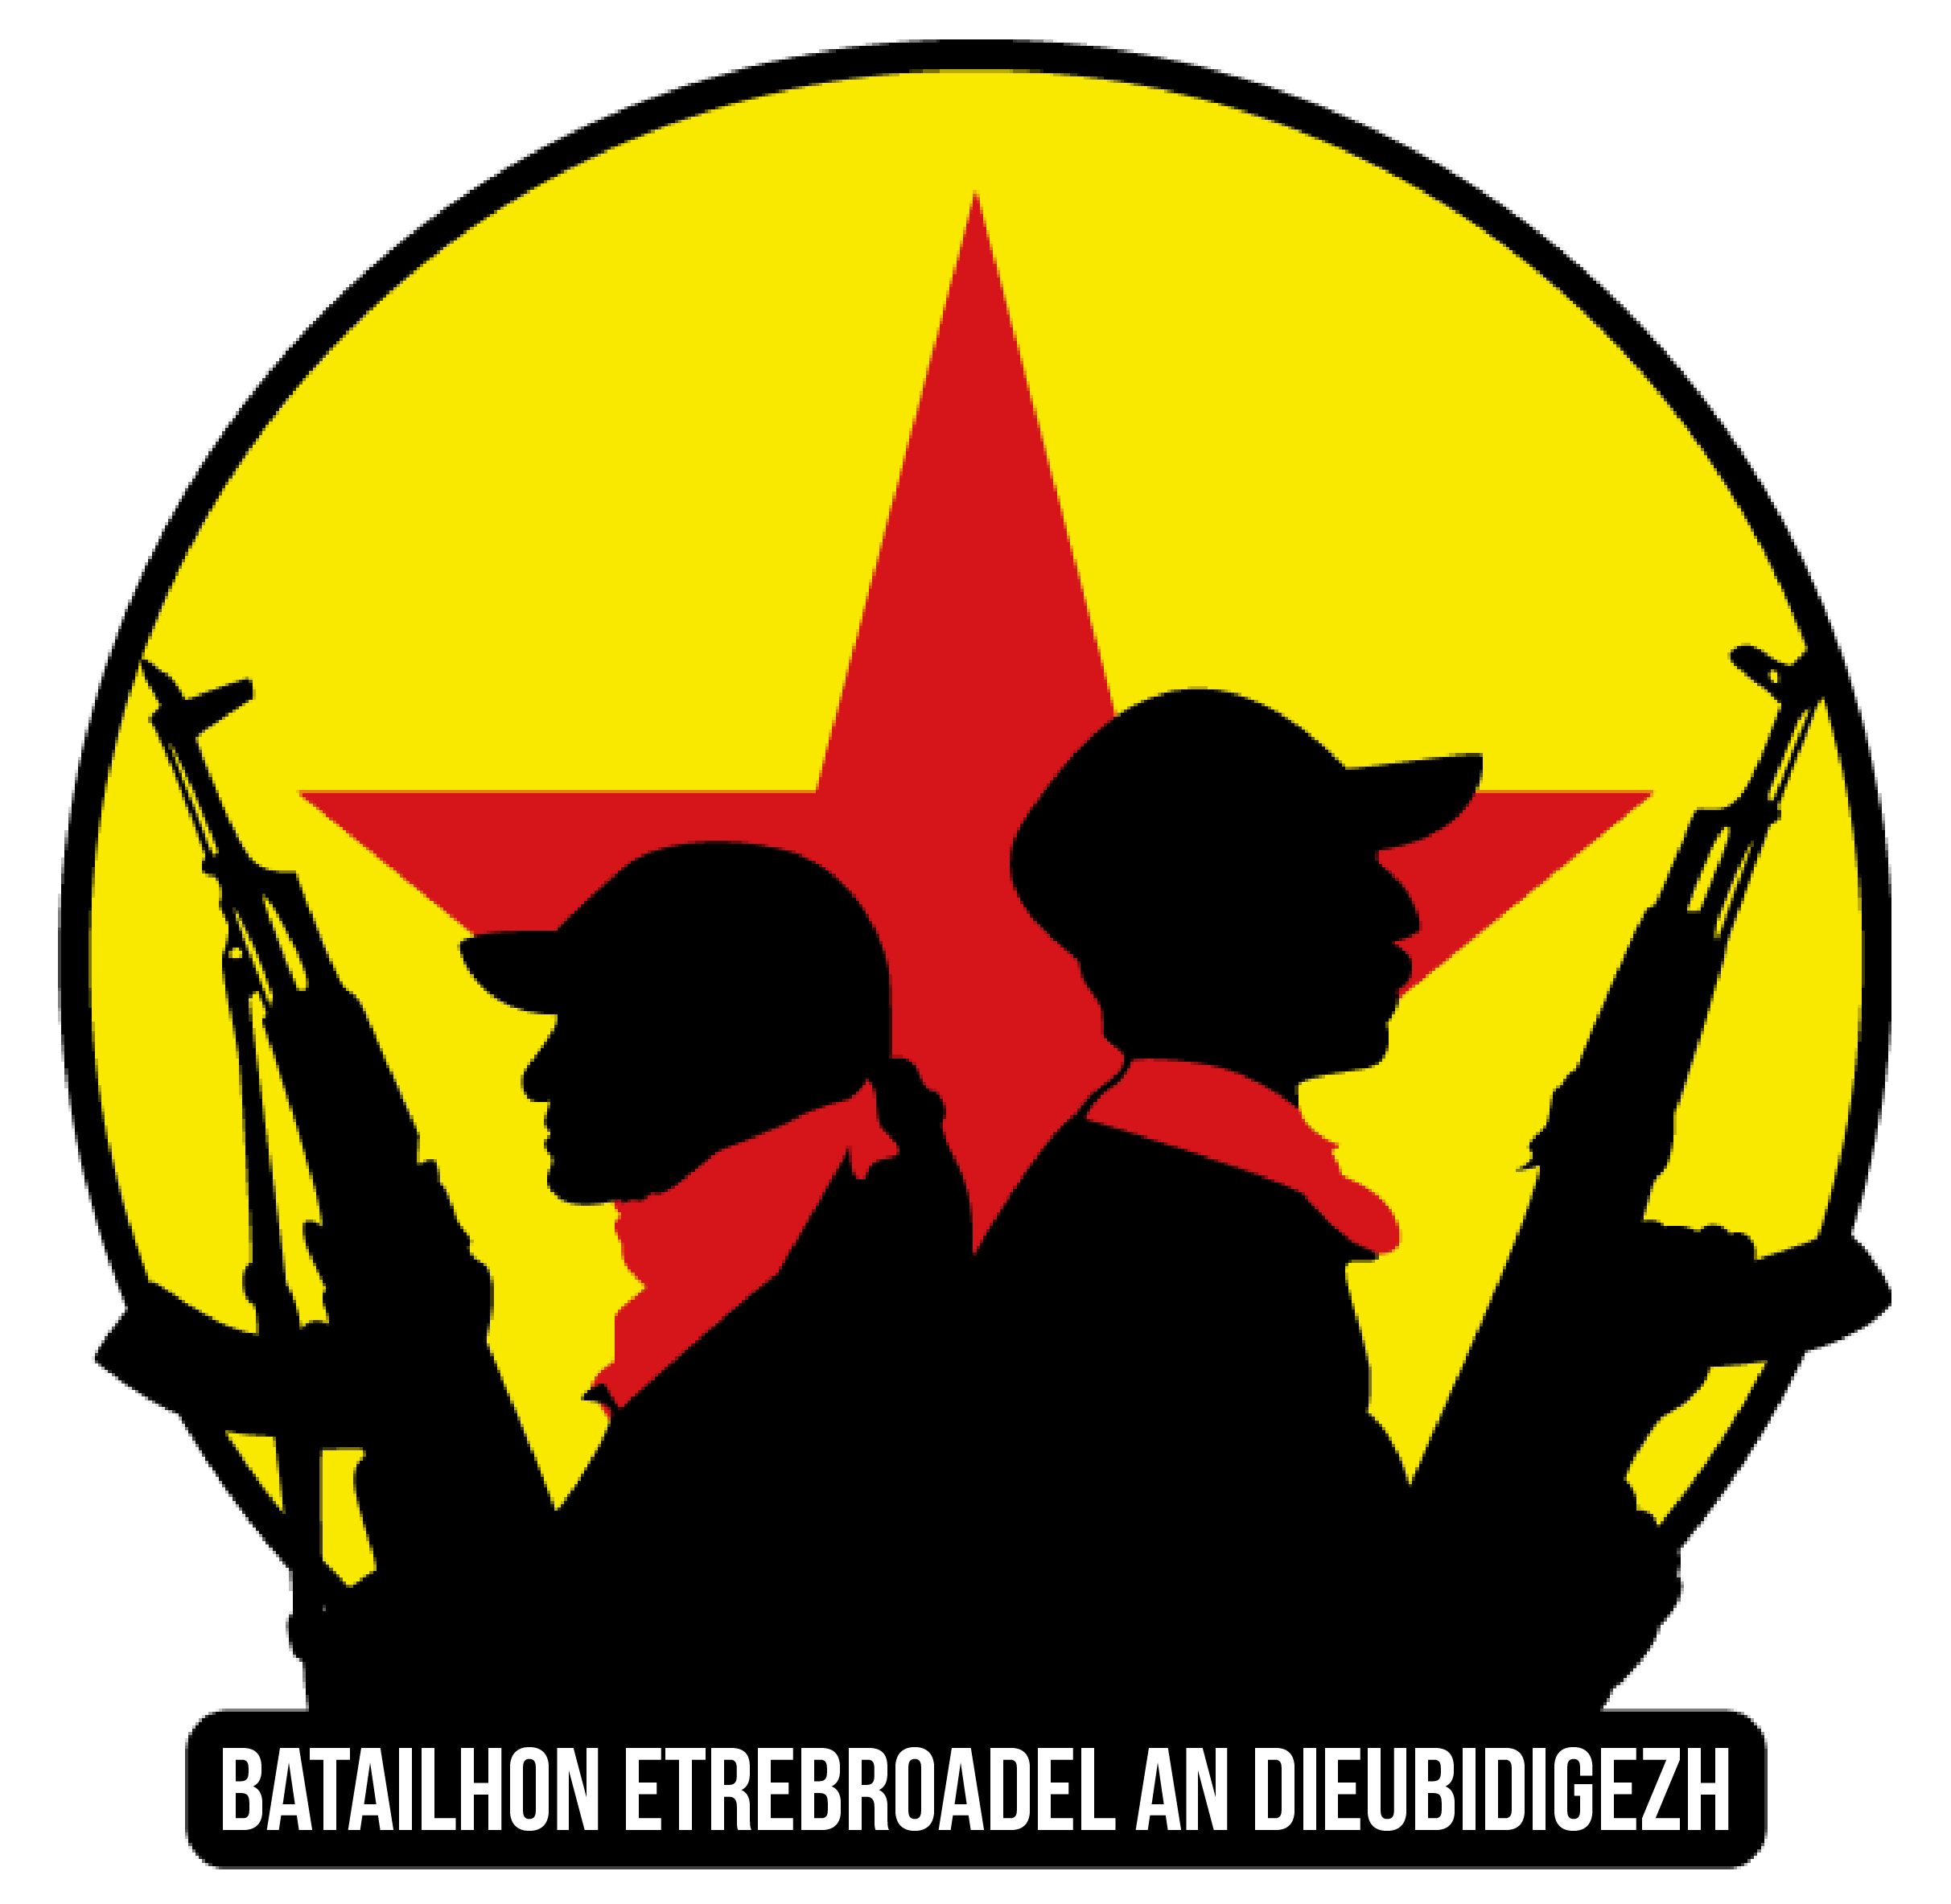 Batailhon_Etrebroadel_Dieubidigezh-01